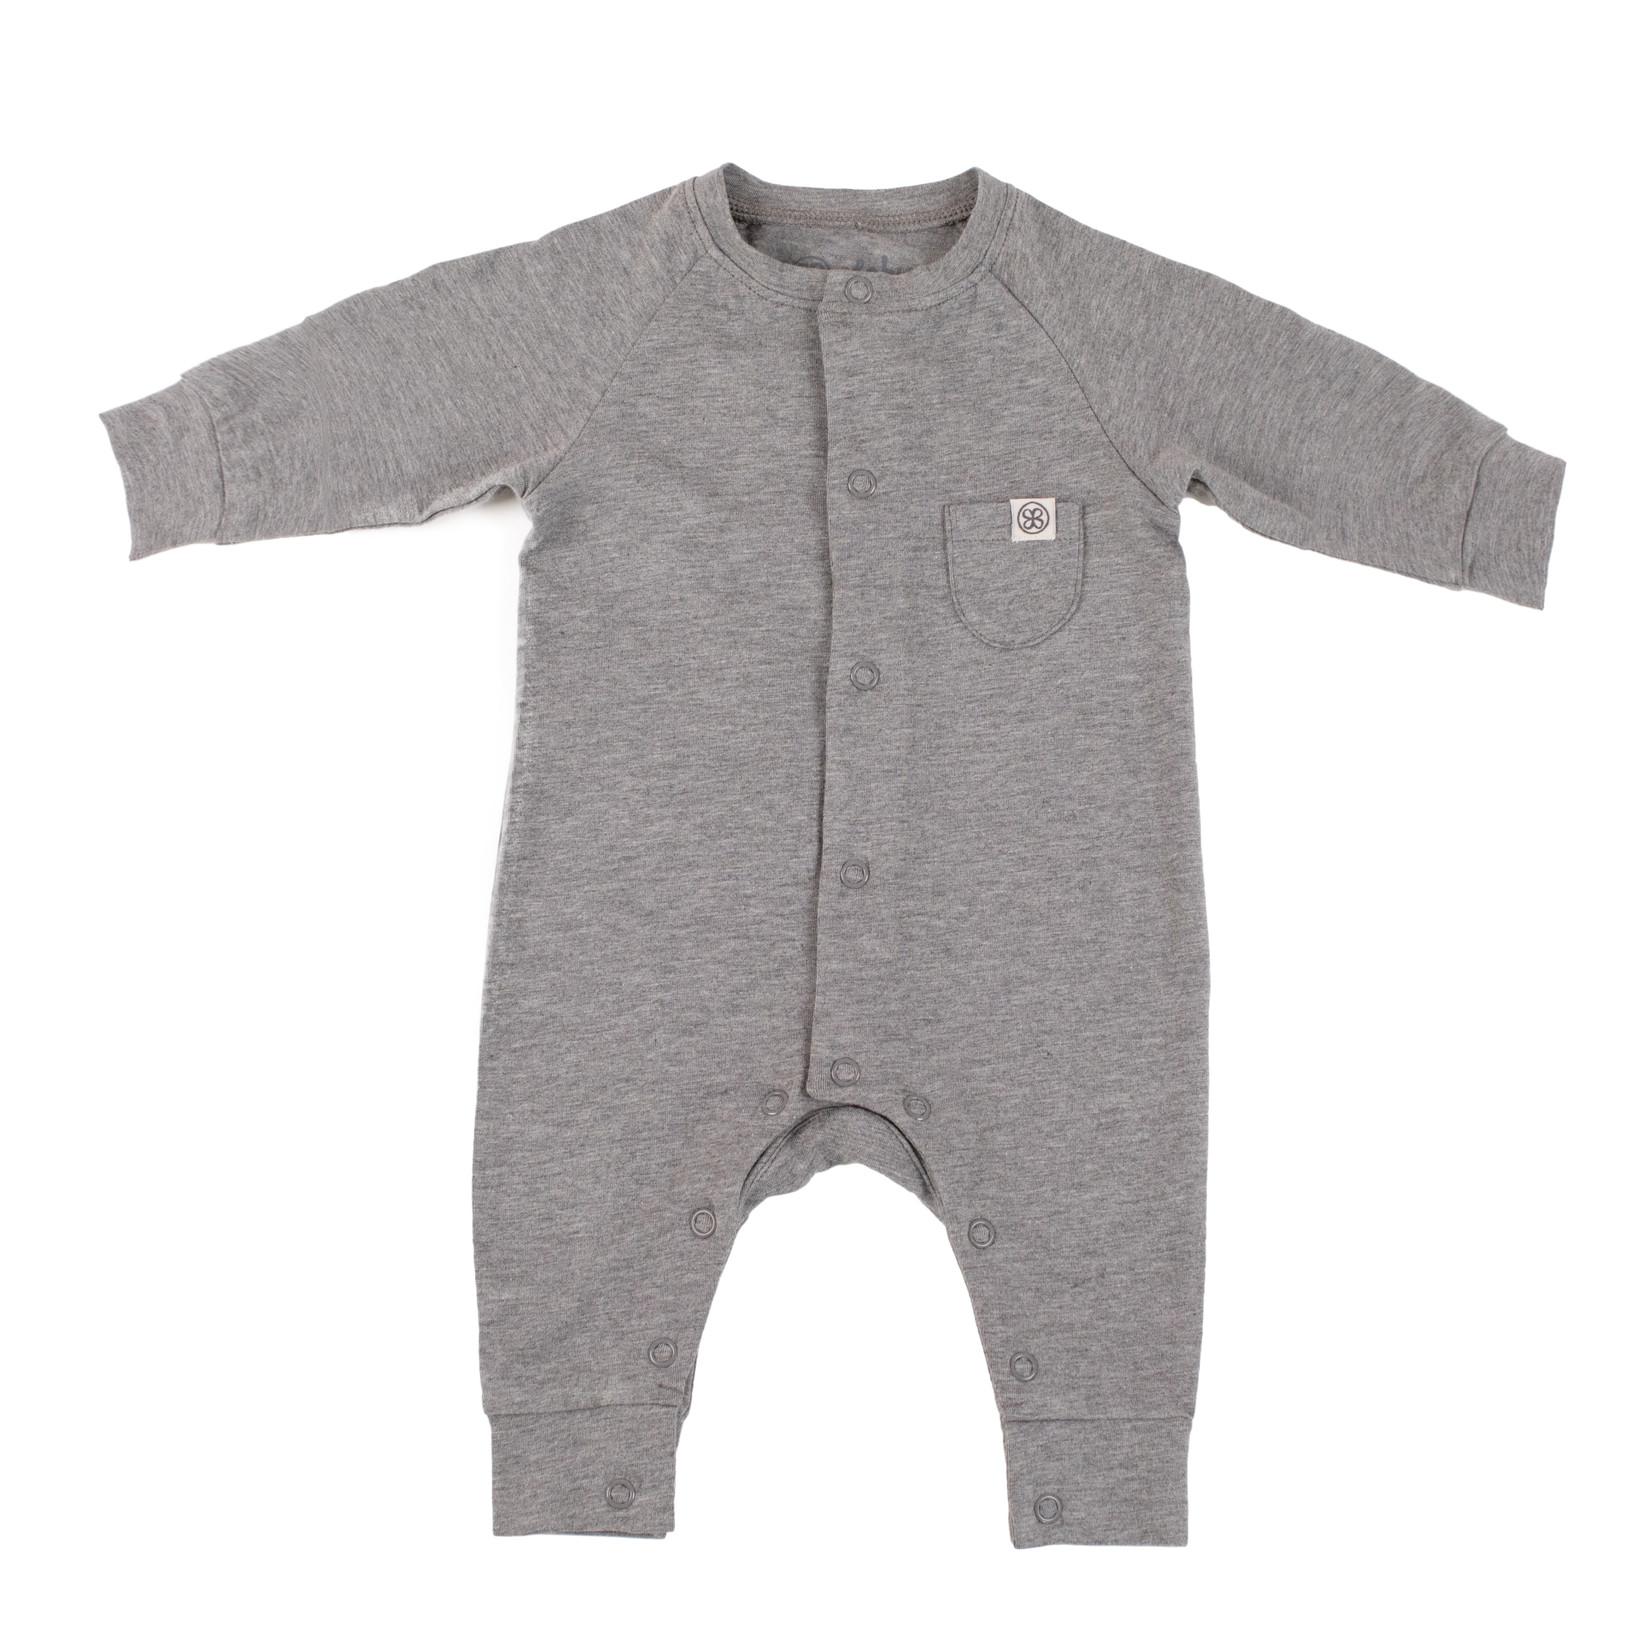 Cloby Baby suit  UPF 50+  Stone Grey